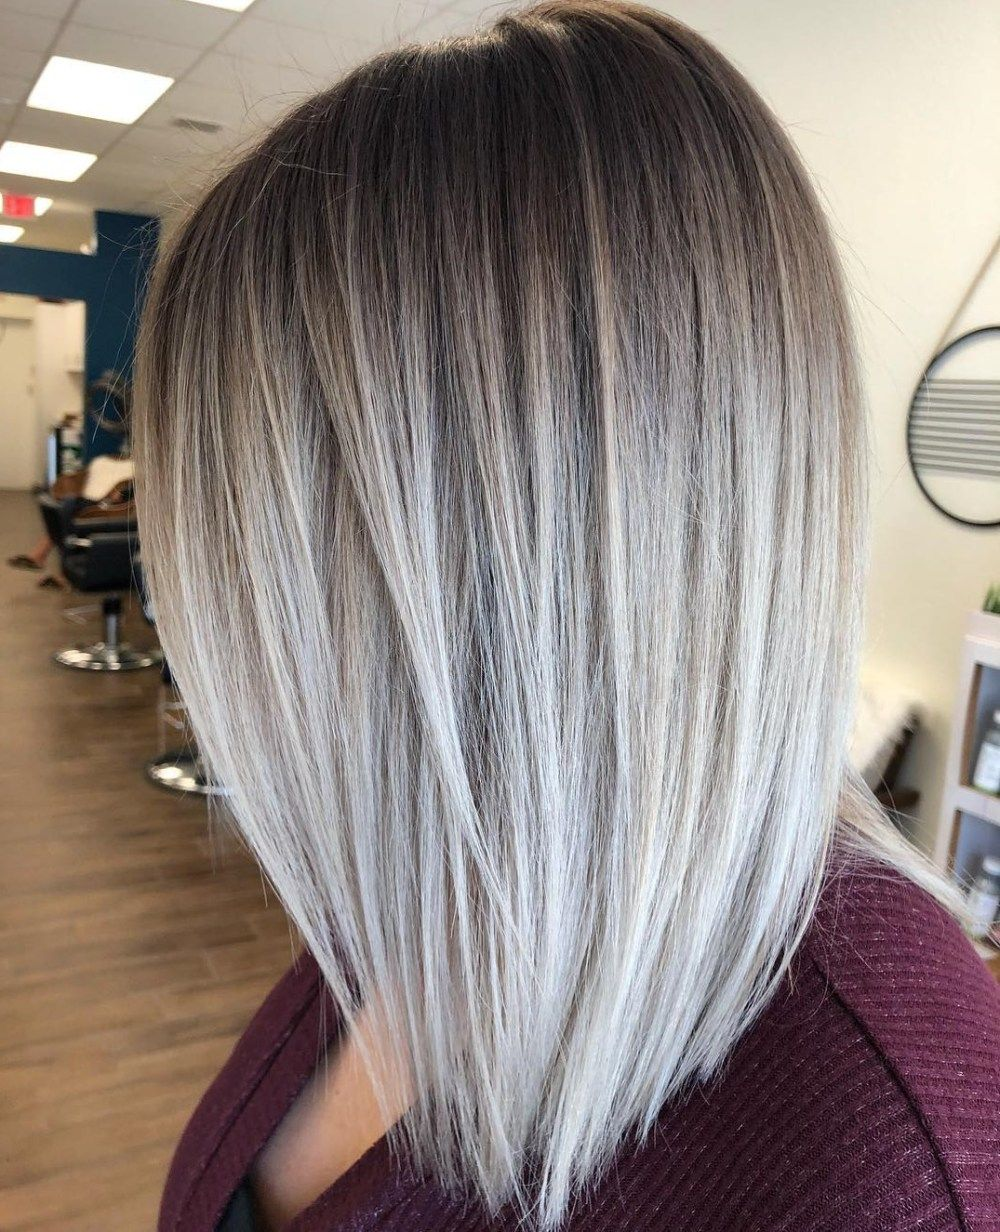 70 Perfect Medium Length Hairstyles For Thin Hair Medium Length Hair Styles Blonde Hair With Roots Hair Styles